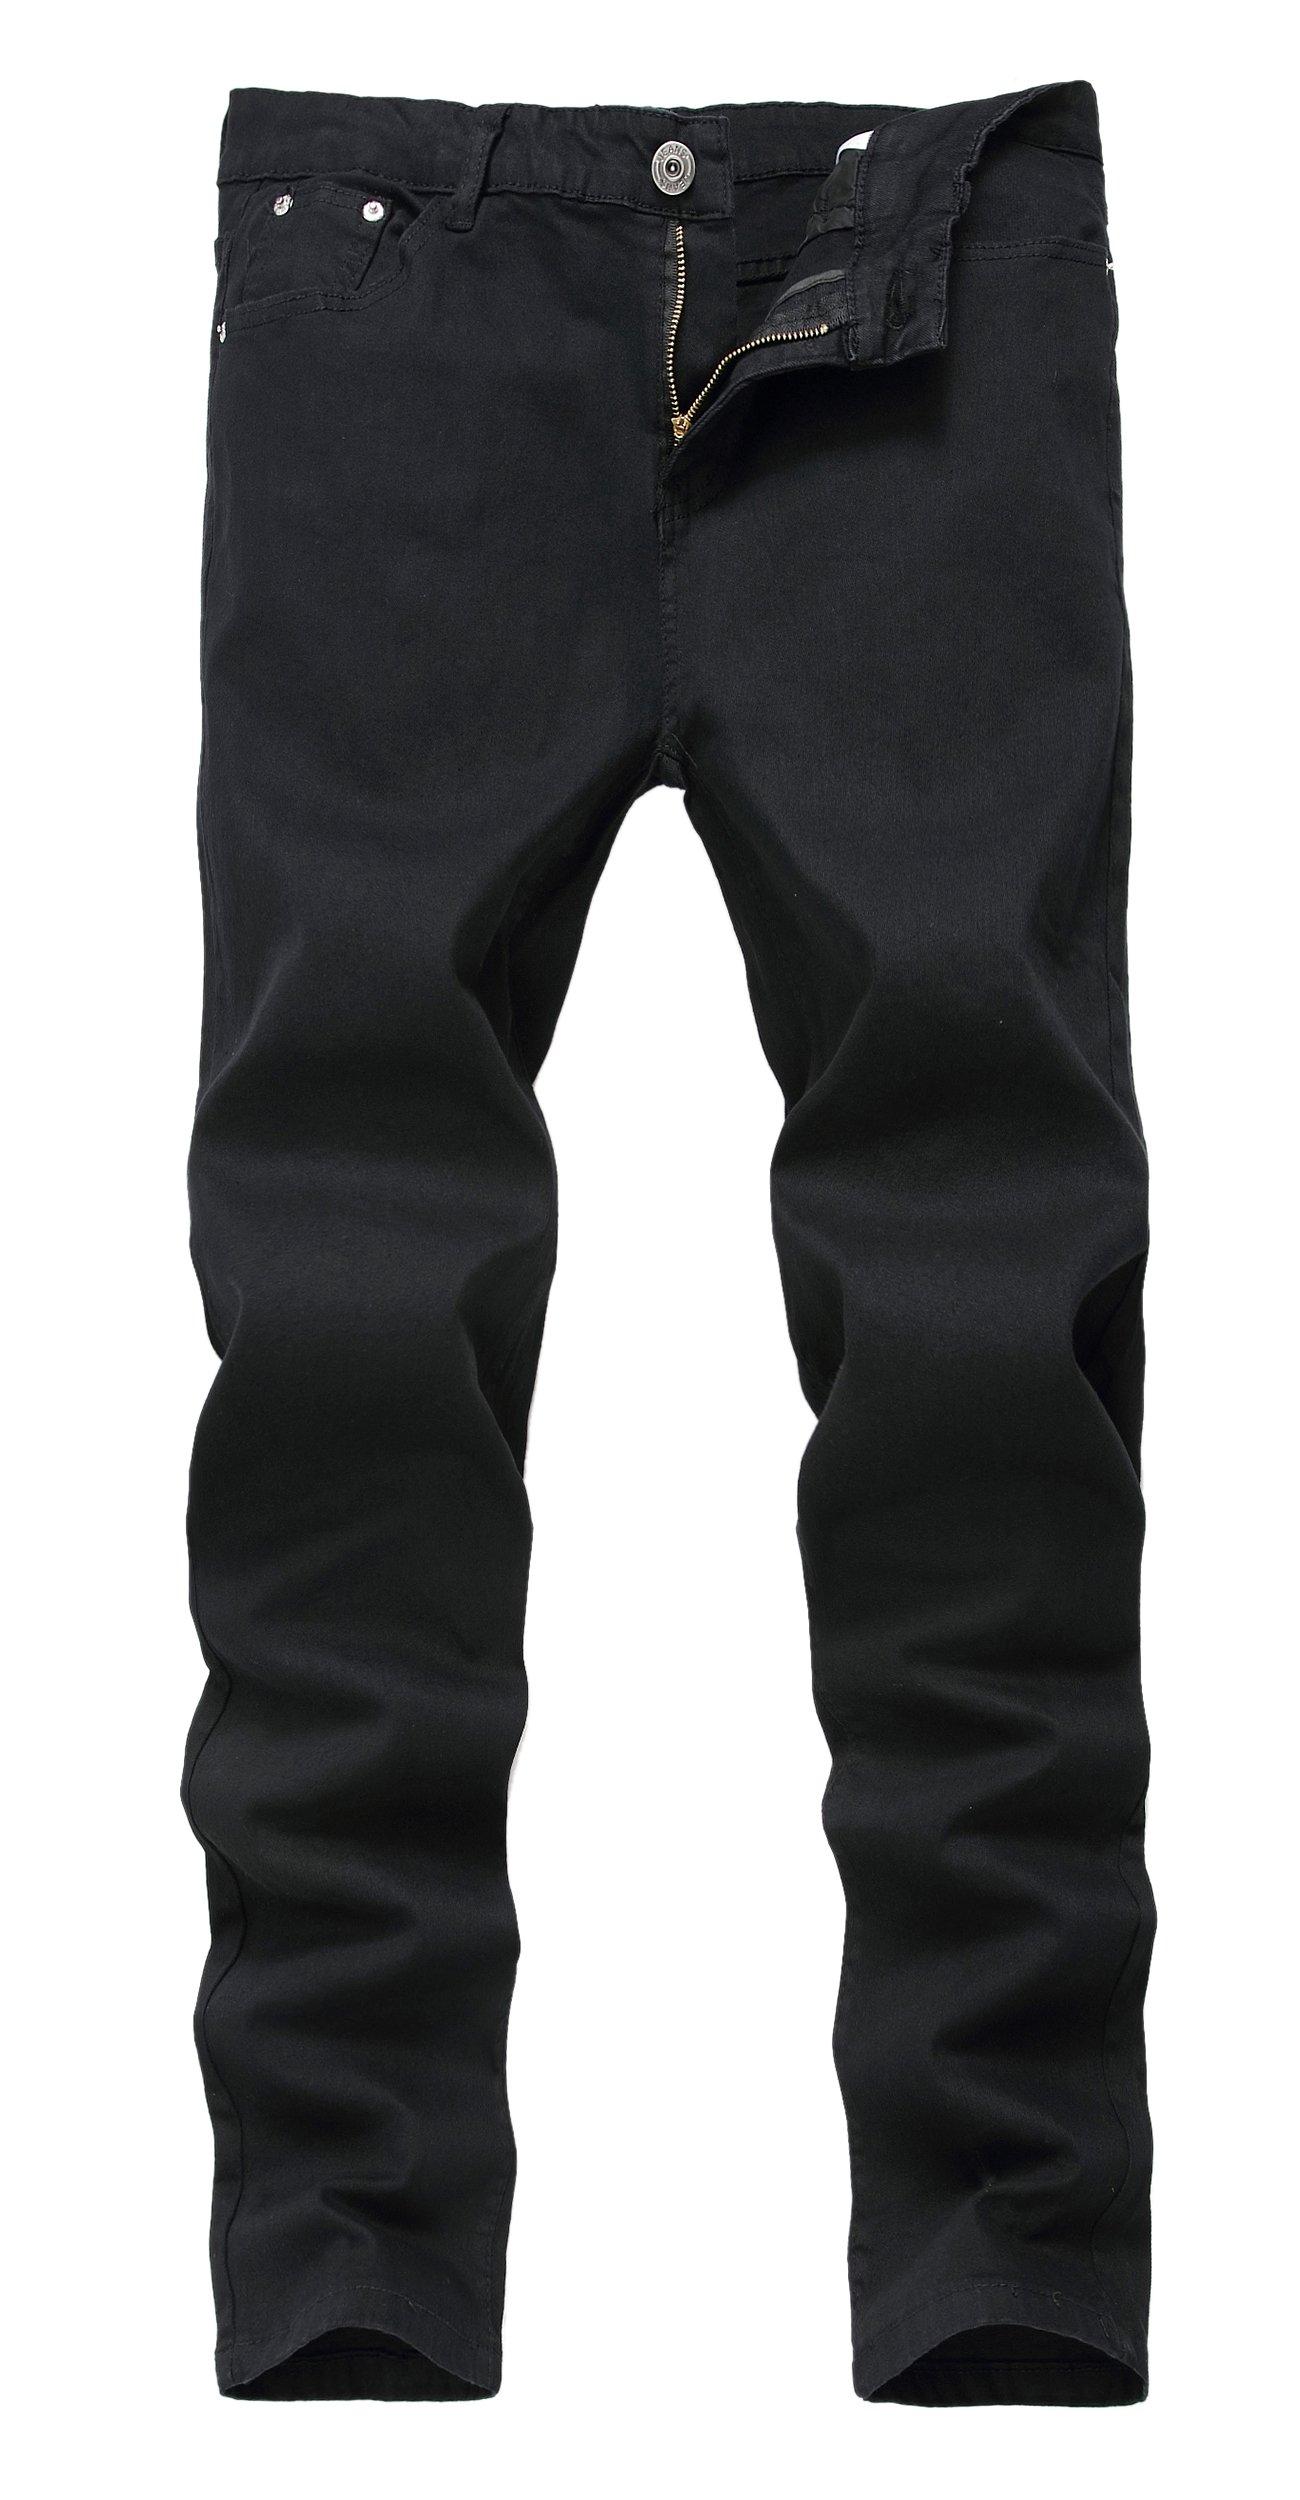 Mens Black Skinny Slim Fit Stretch Straight Leg Fashion Jeans Pants, Black, 32W